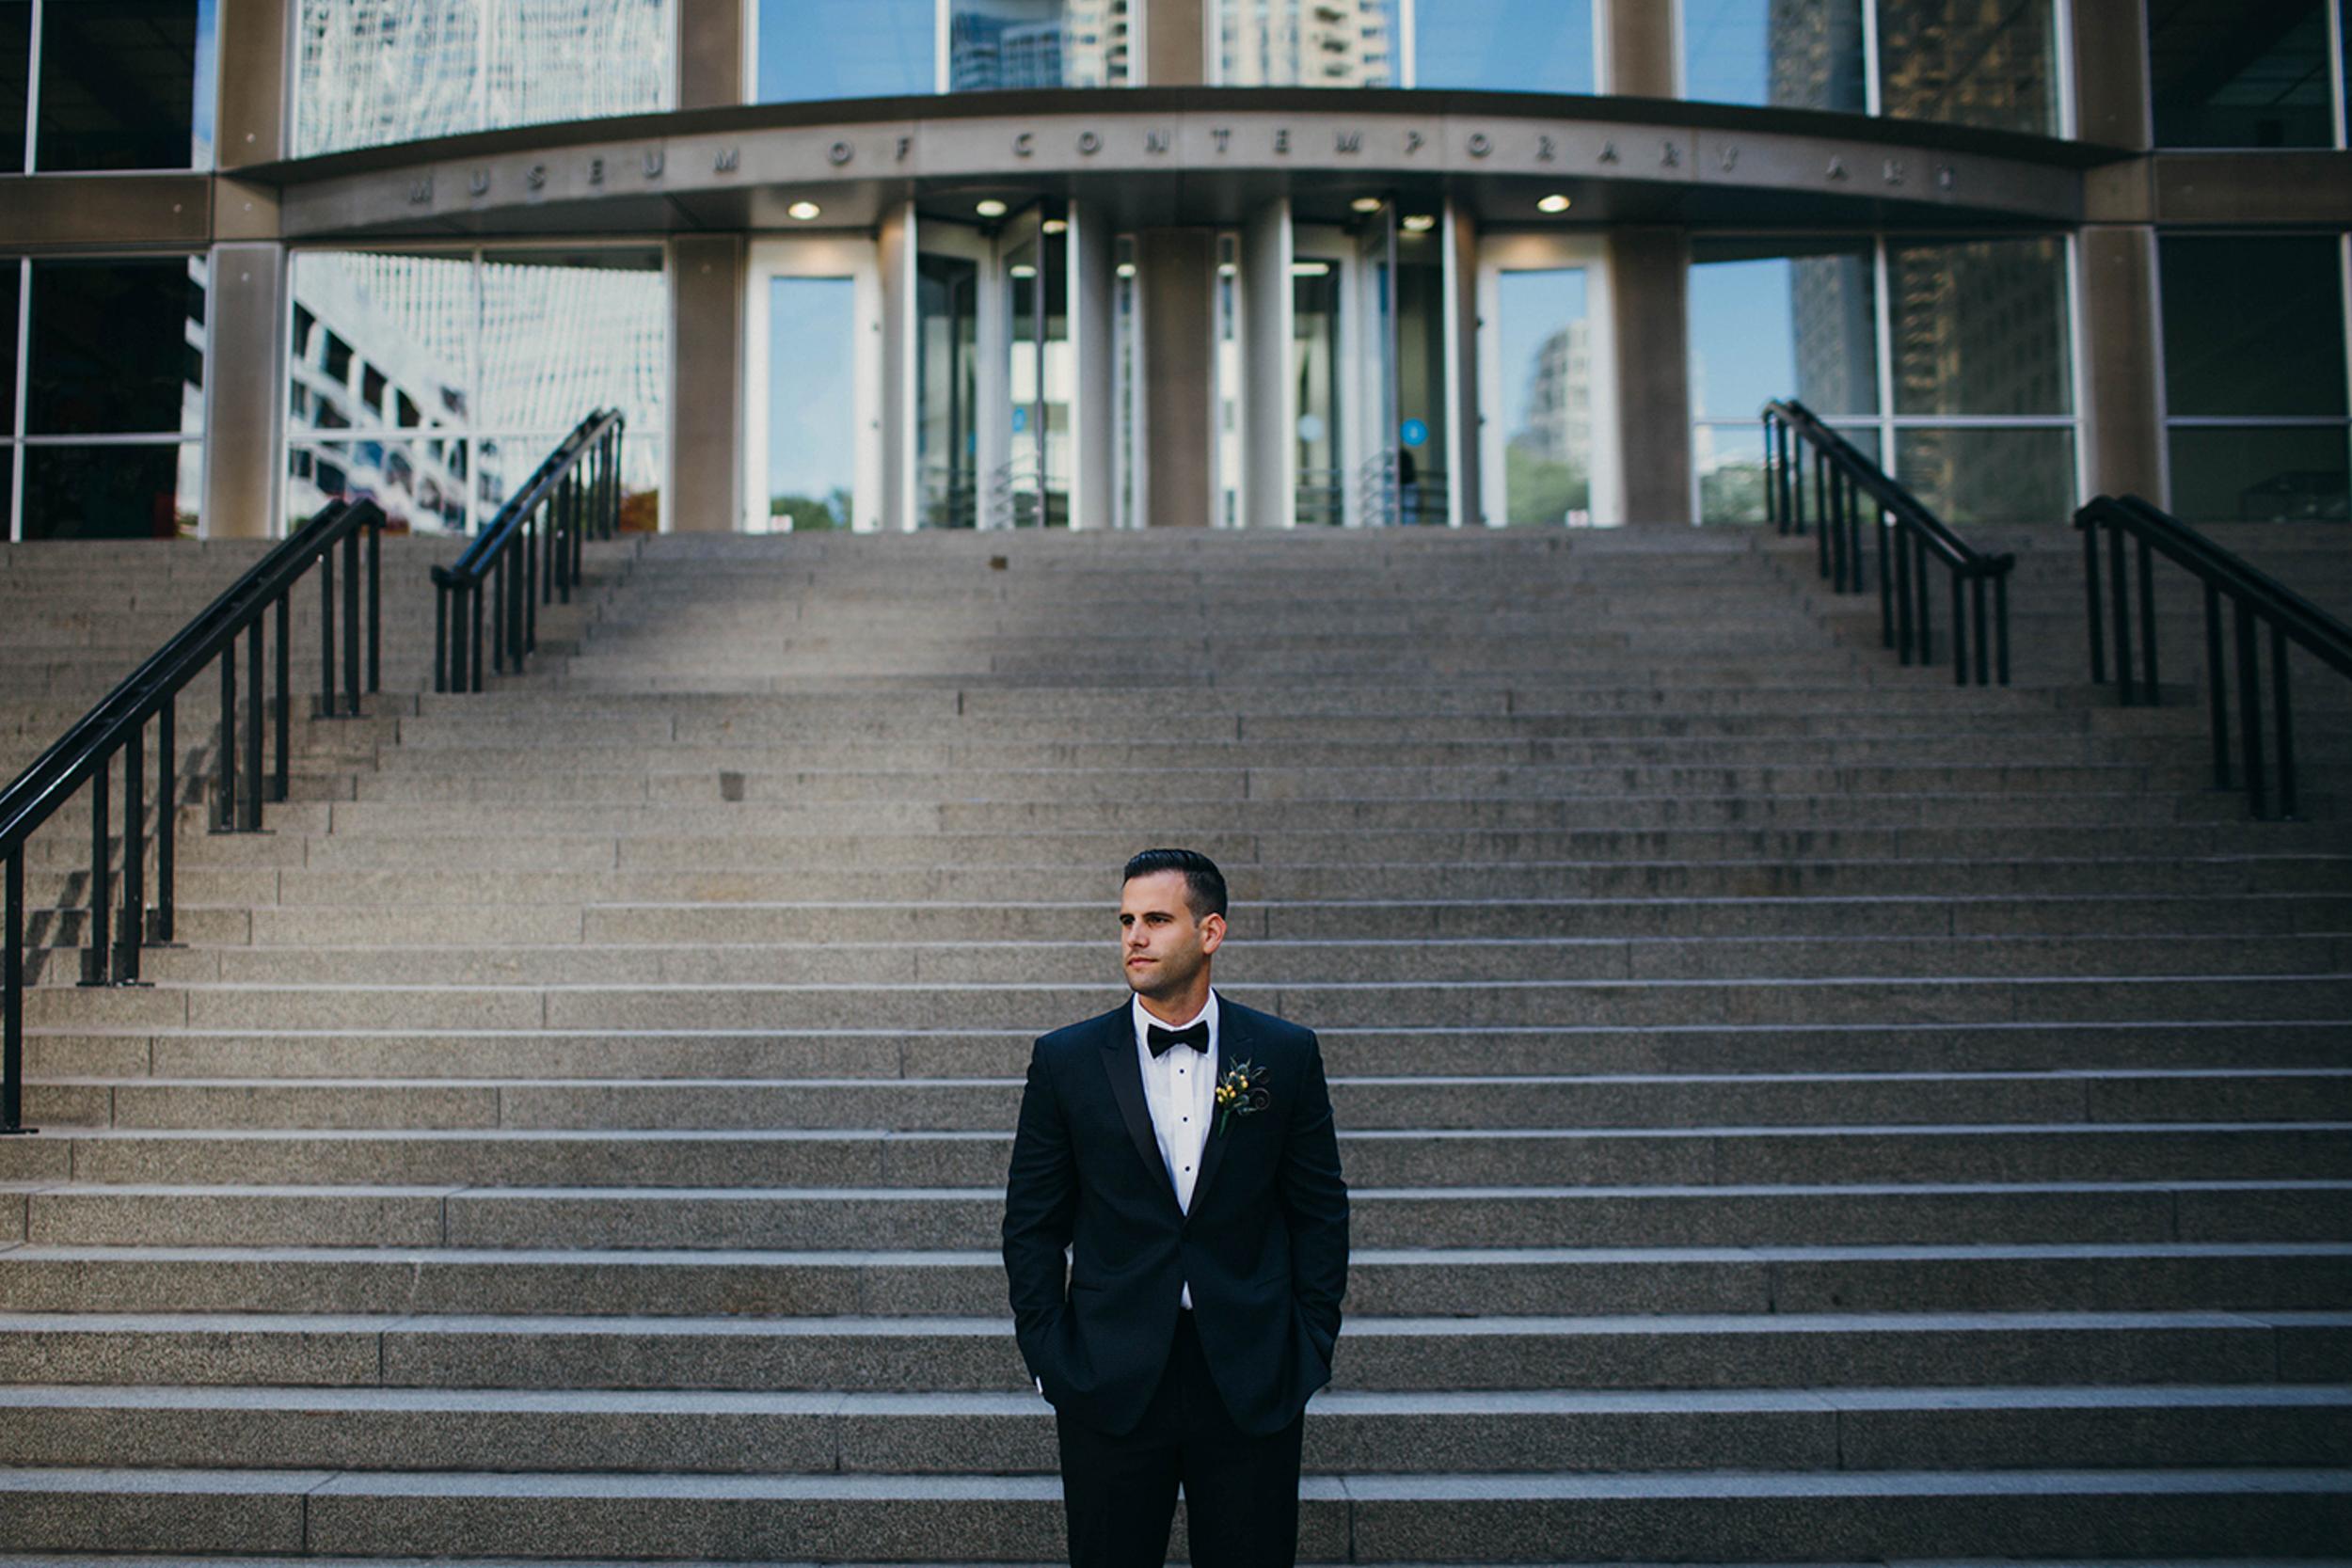 chicago.wedding.urban.intimate.zed451.lake.milton olive park-23.jpg